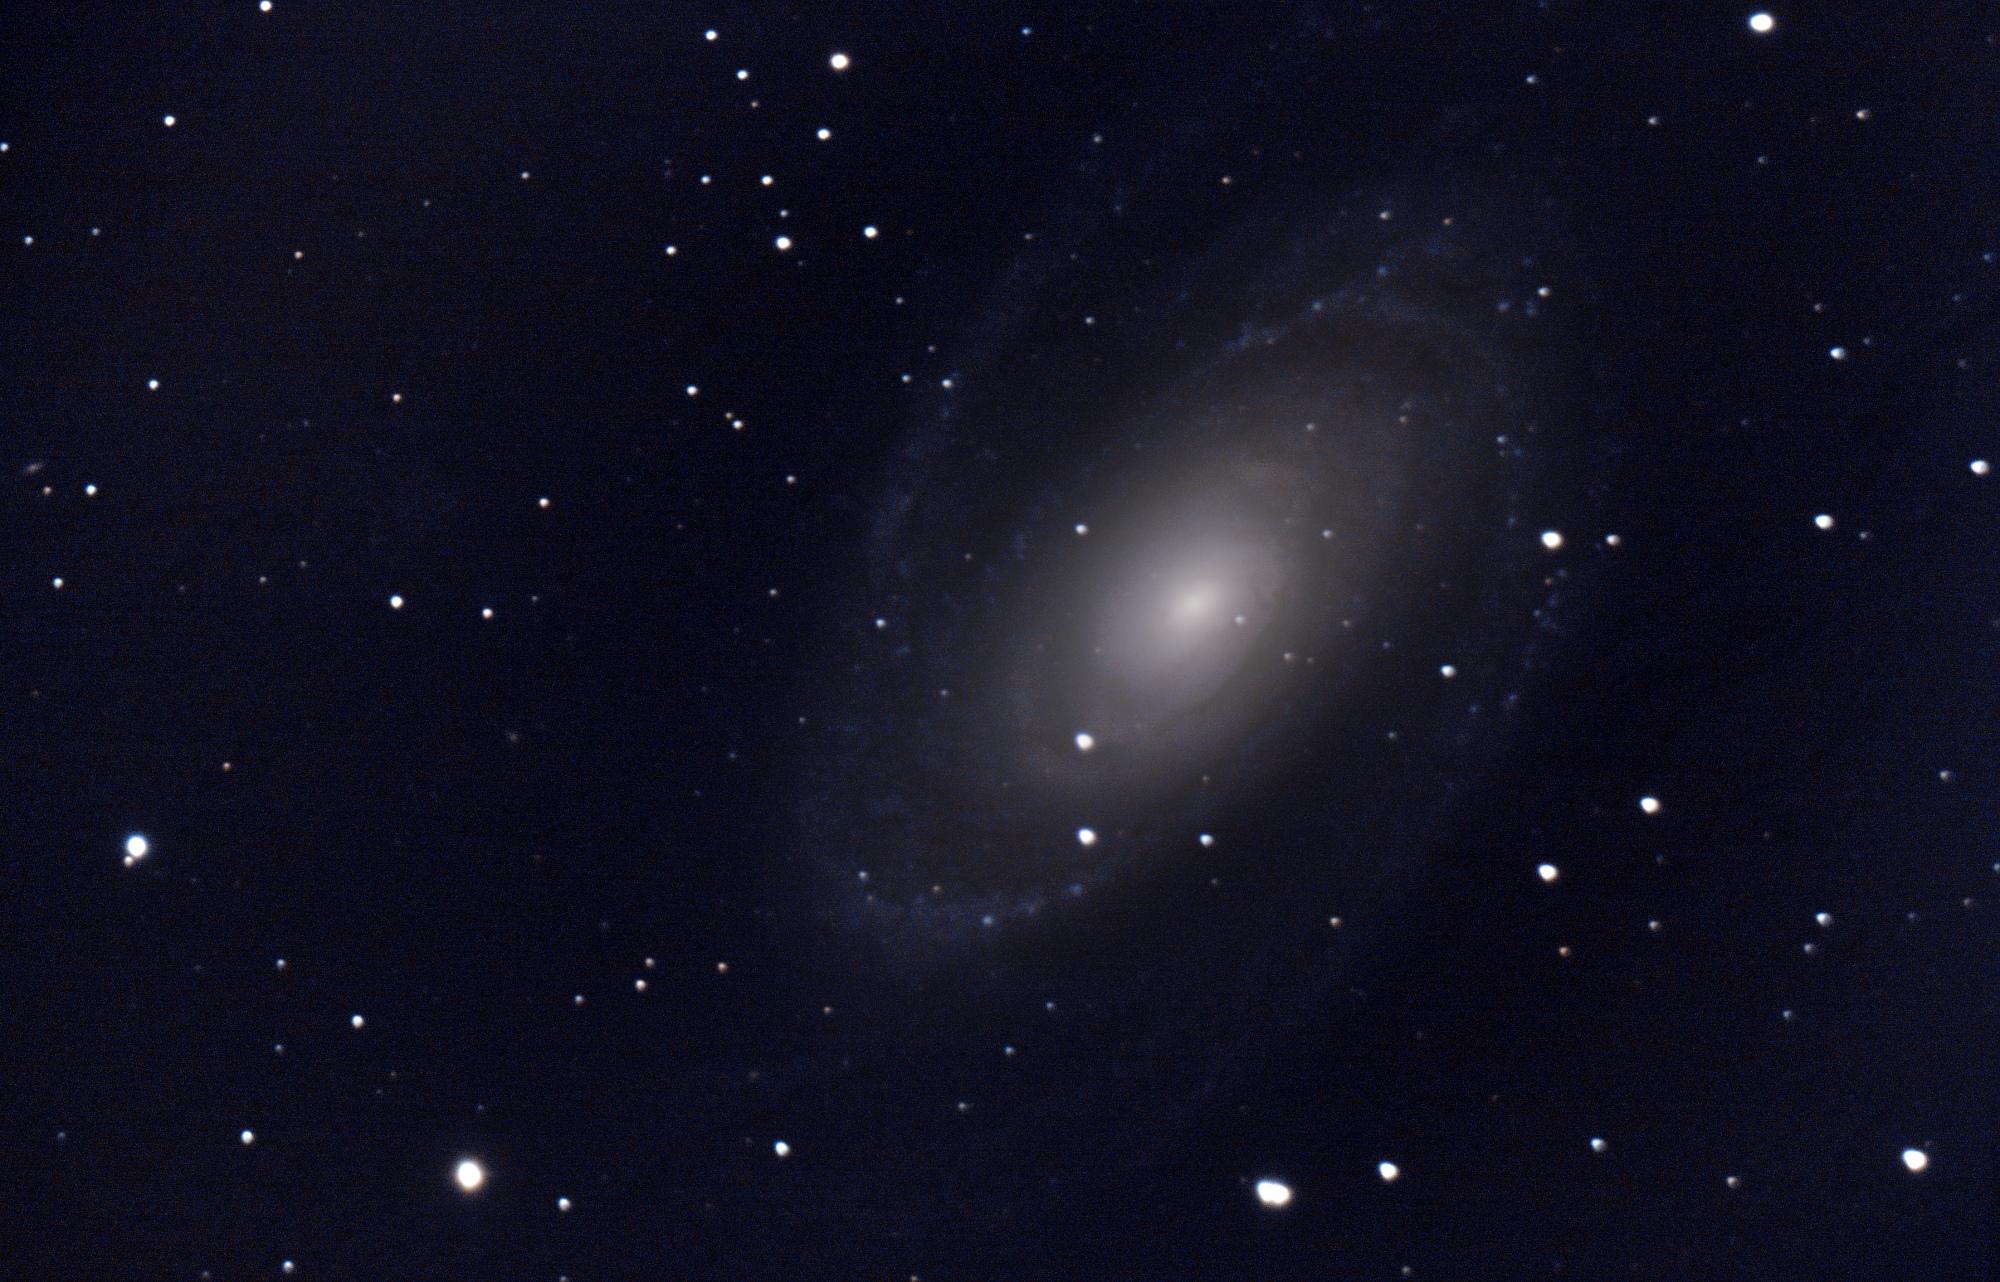 M81_SIRIL_CS2_v2.thumb.jpg.33920ca96932f602987dee6b515cca56.jpg